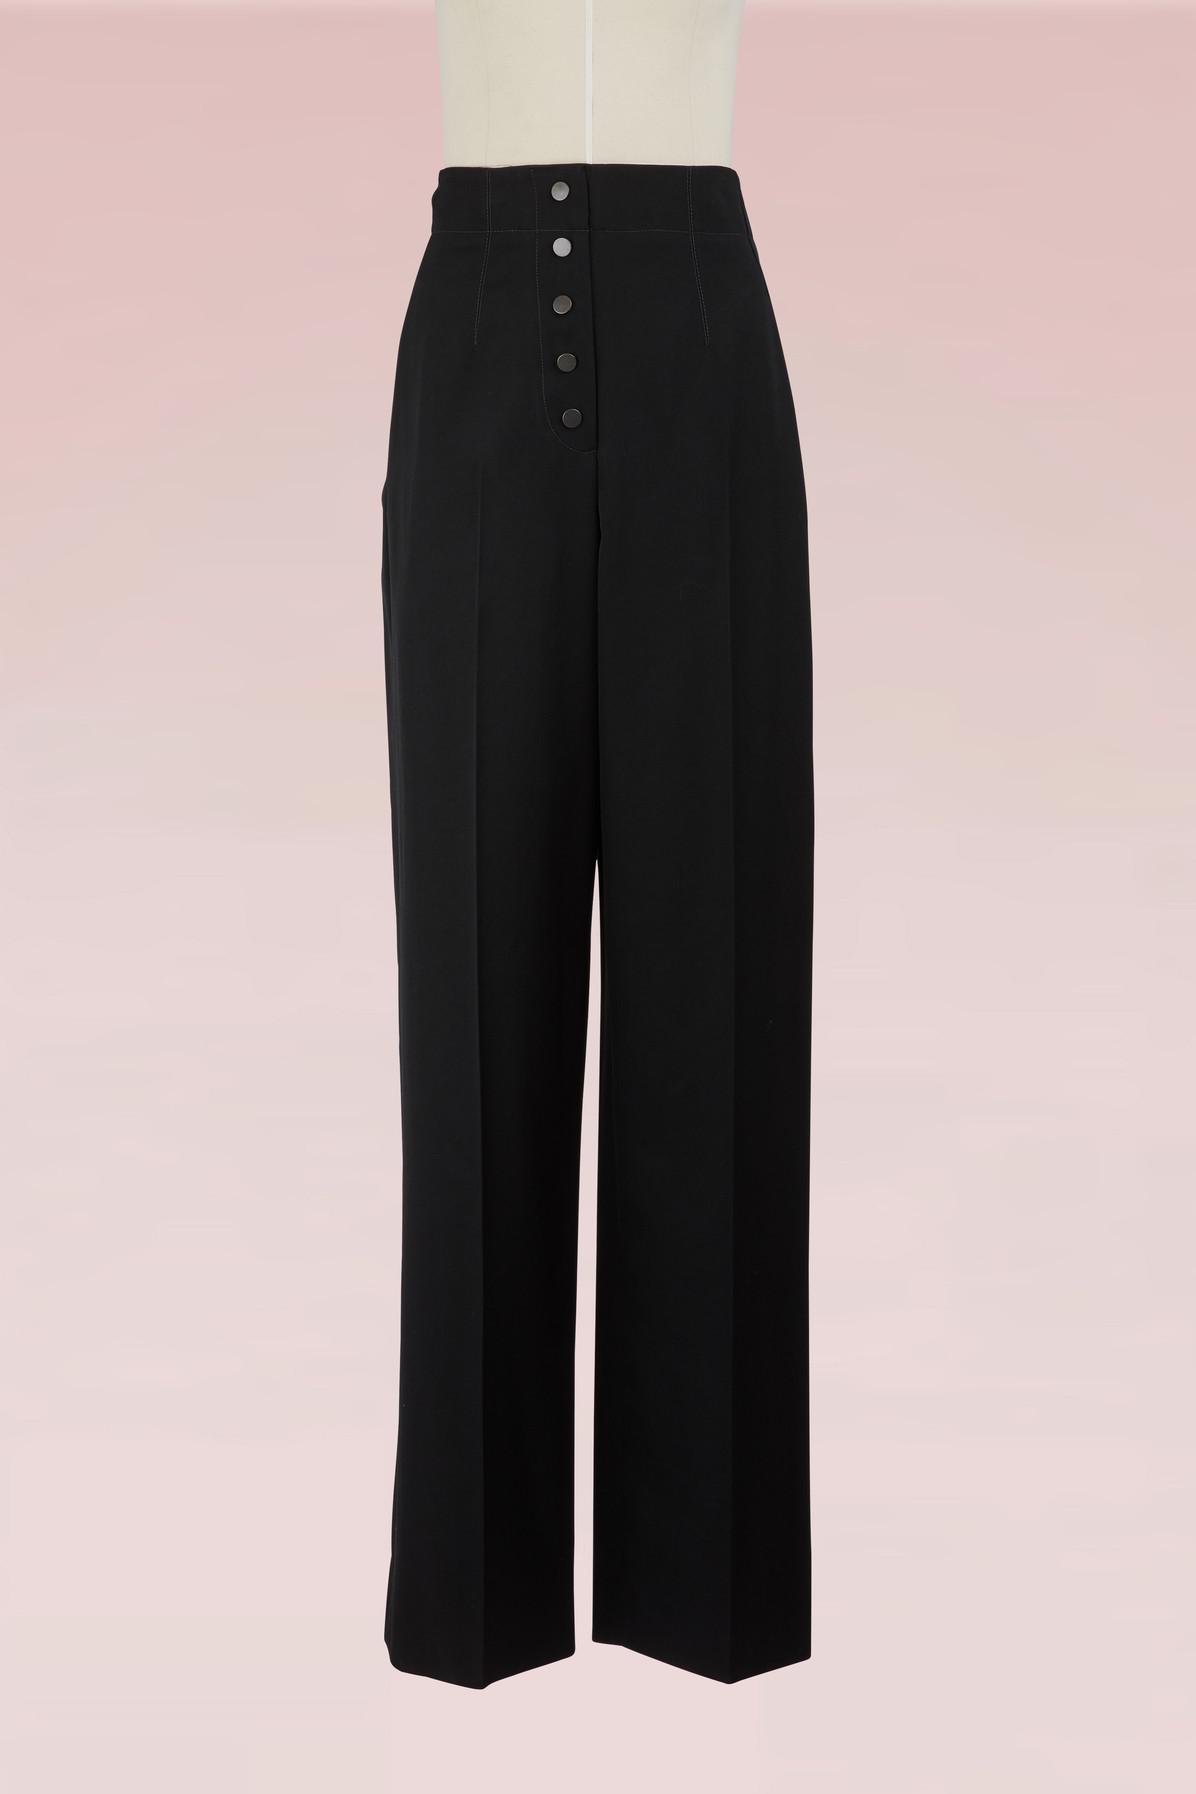 Fabienne Wool Pants Stella McCartney Original For Sale Wsinwz